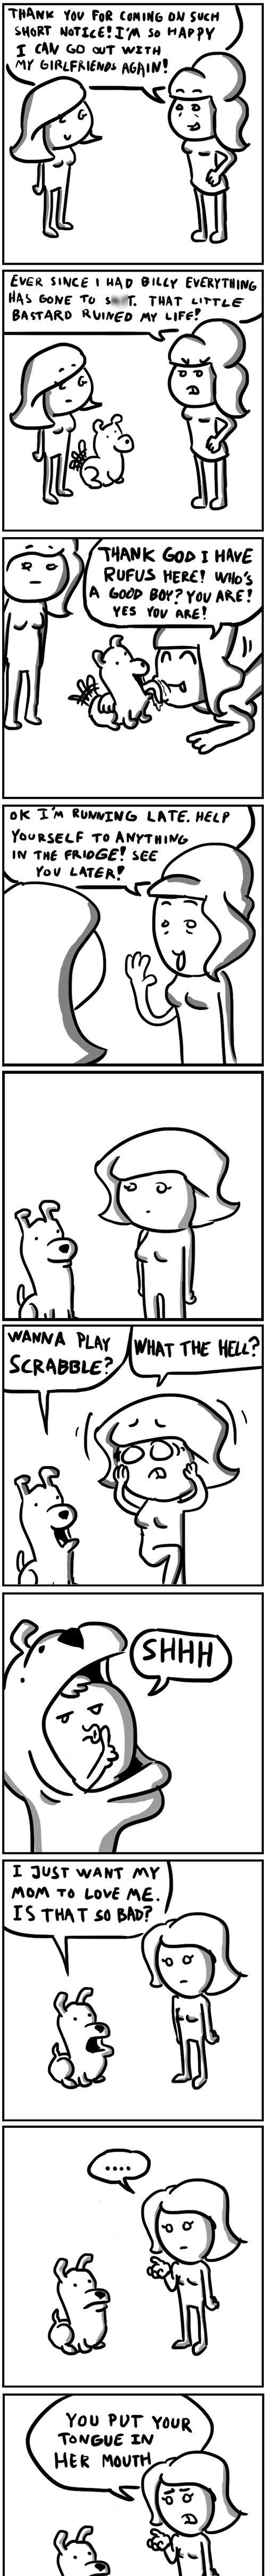 dogs kids gross web comics - 8433792512